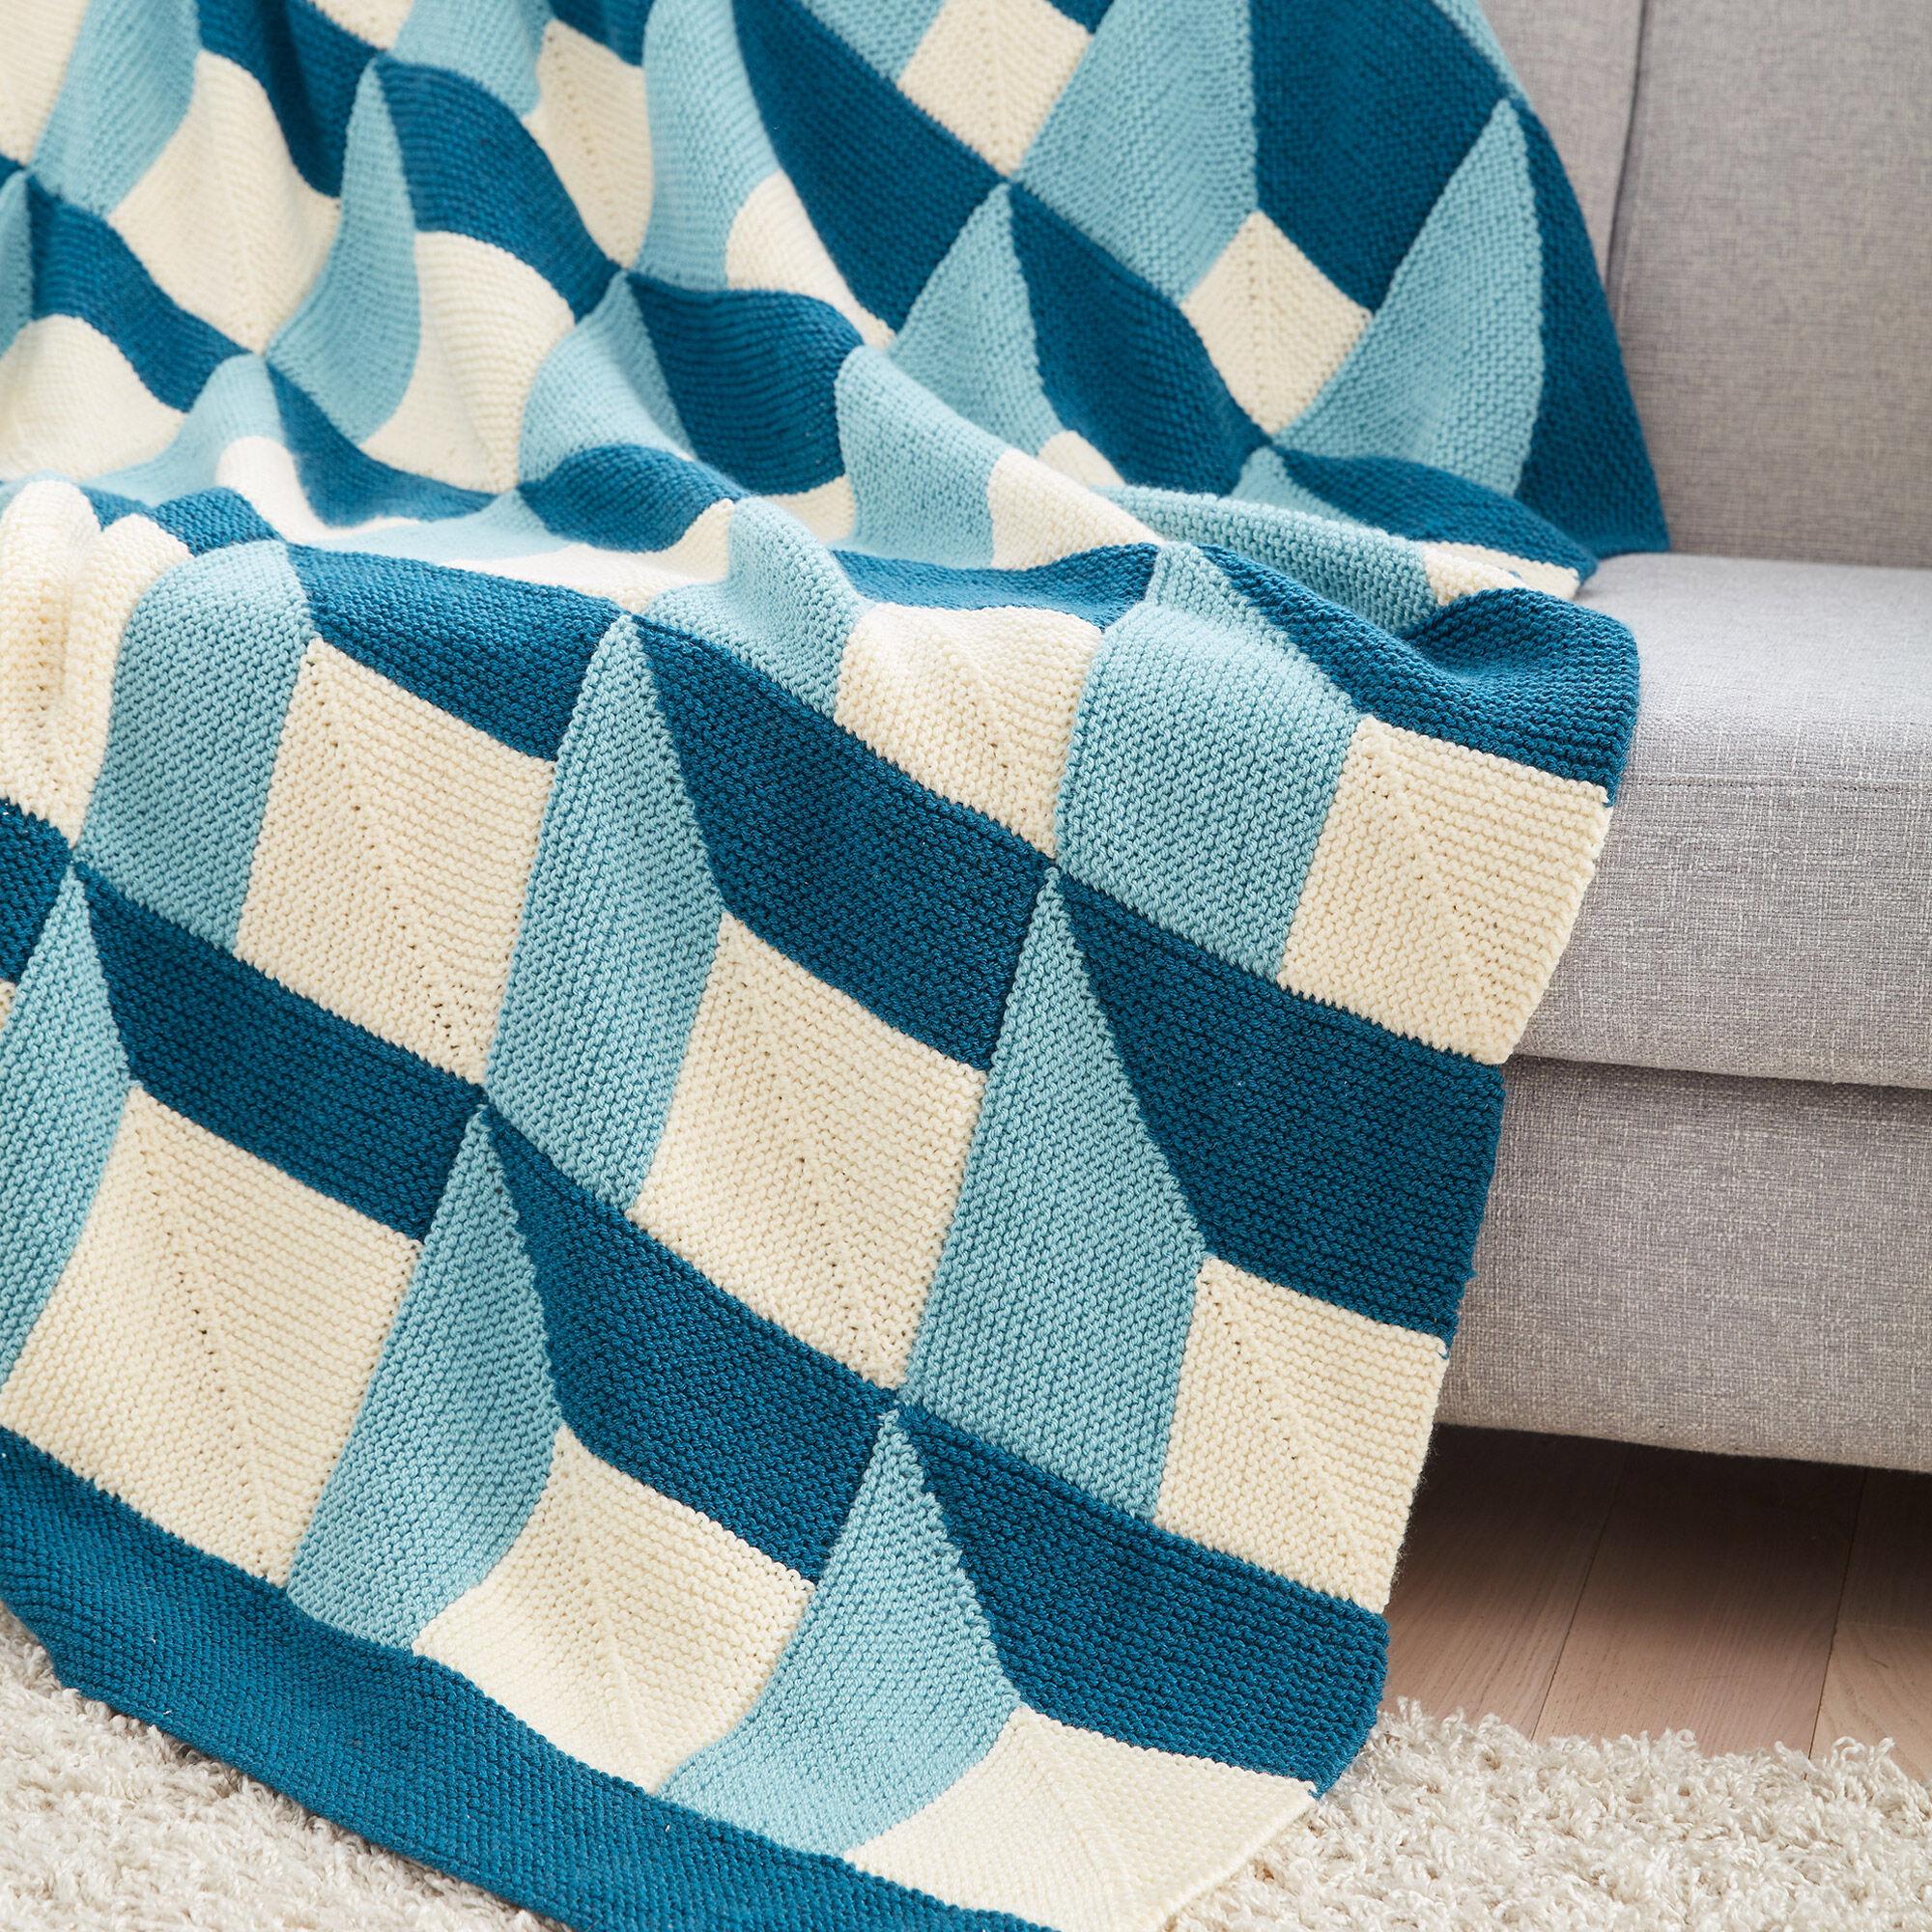 Patons Knit Shadowbox Blanket Pattern   Yarnspirations